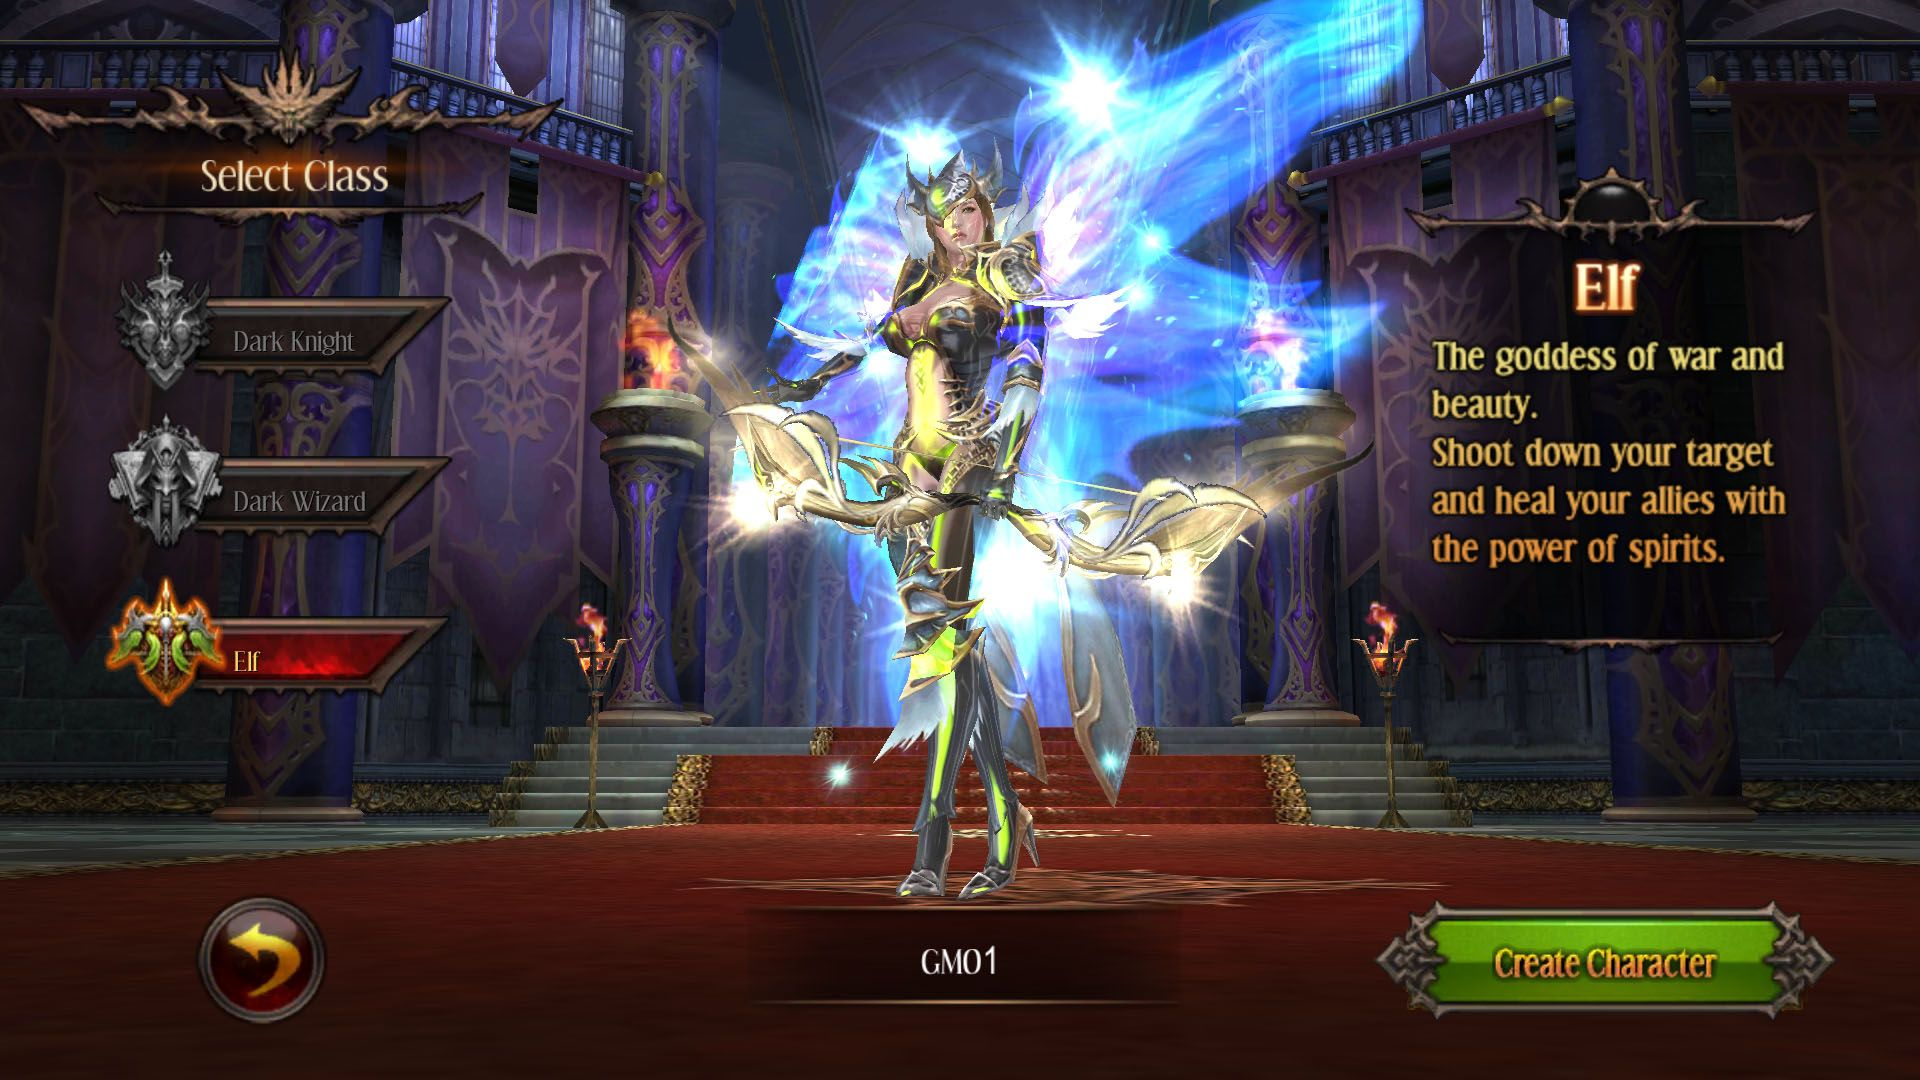 MU Origin Free Online MMORPG And MMO Games List